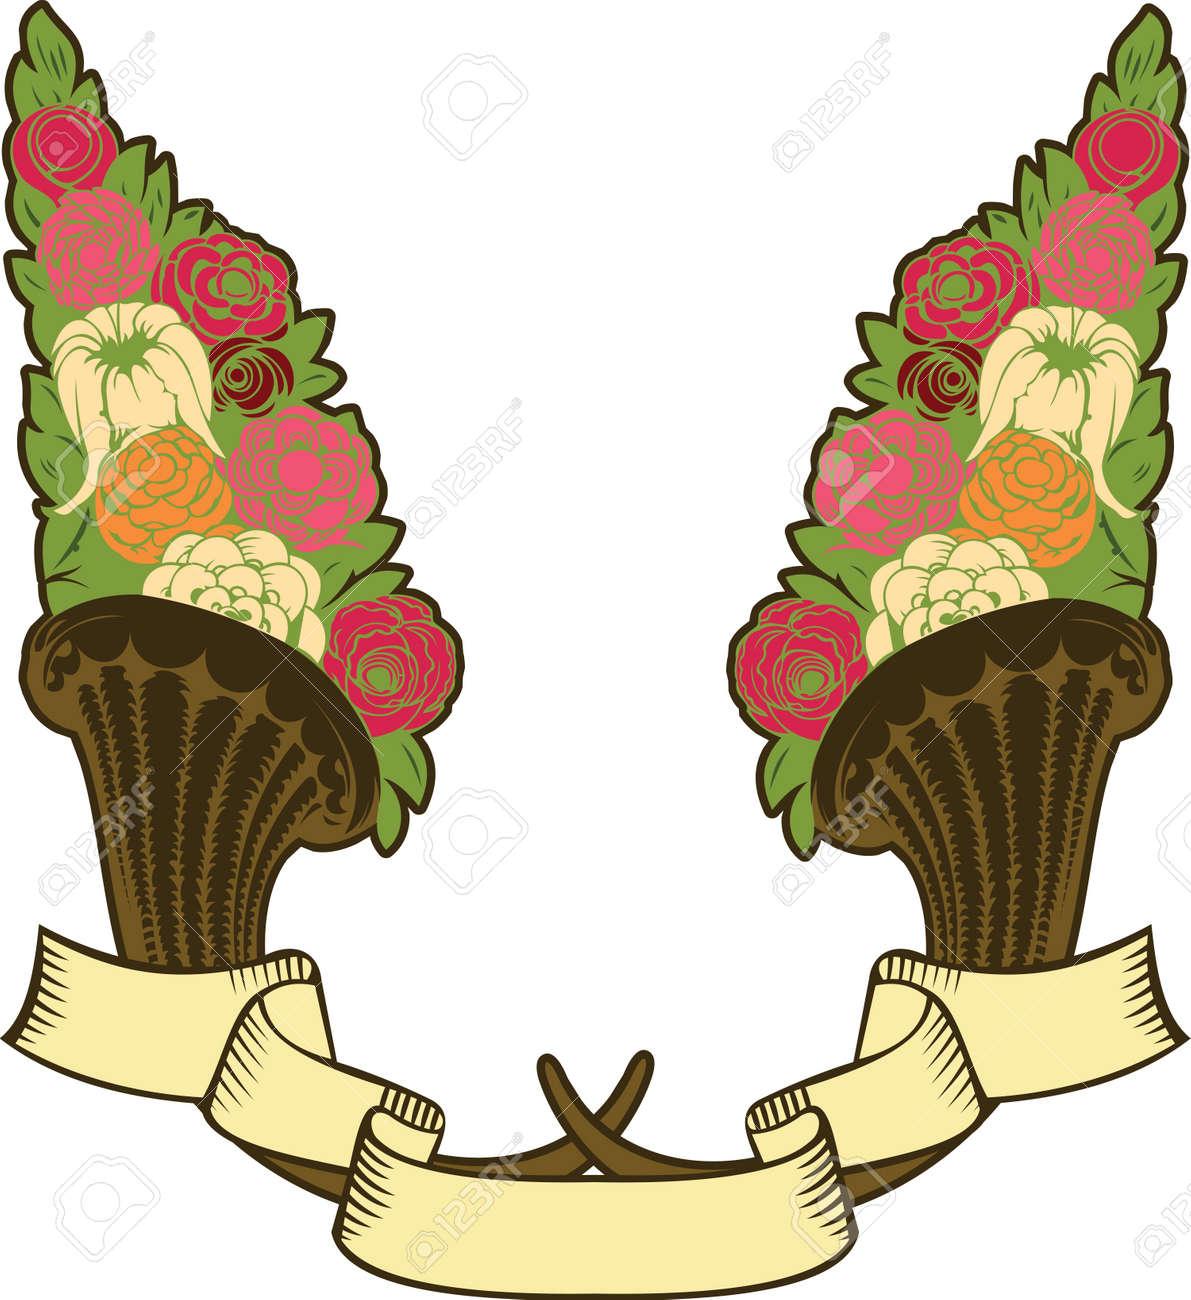 vintage horn of plenty, flowers and banner Stock Vector - 13634400